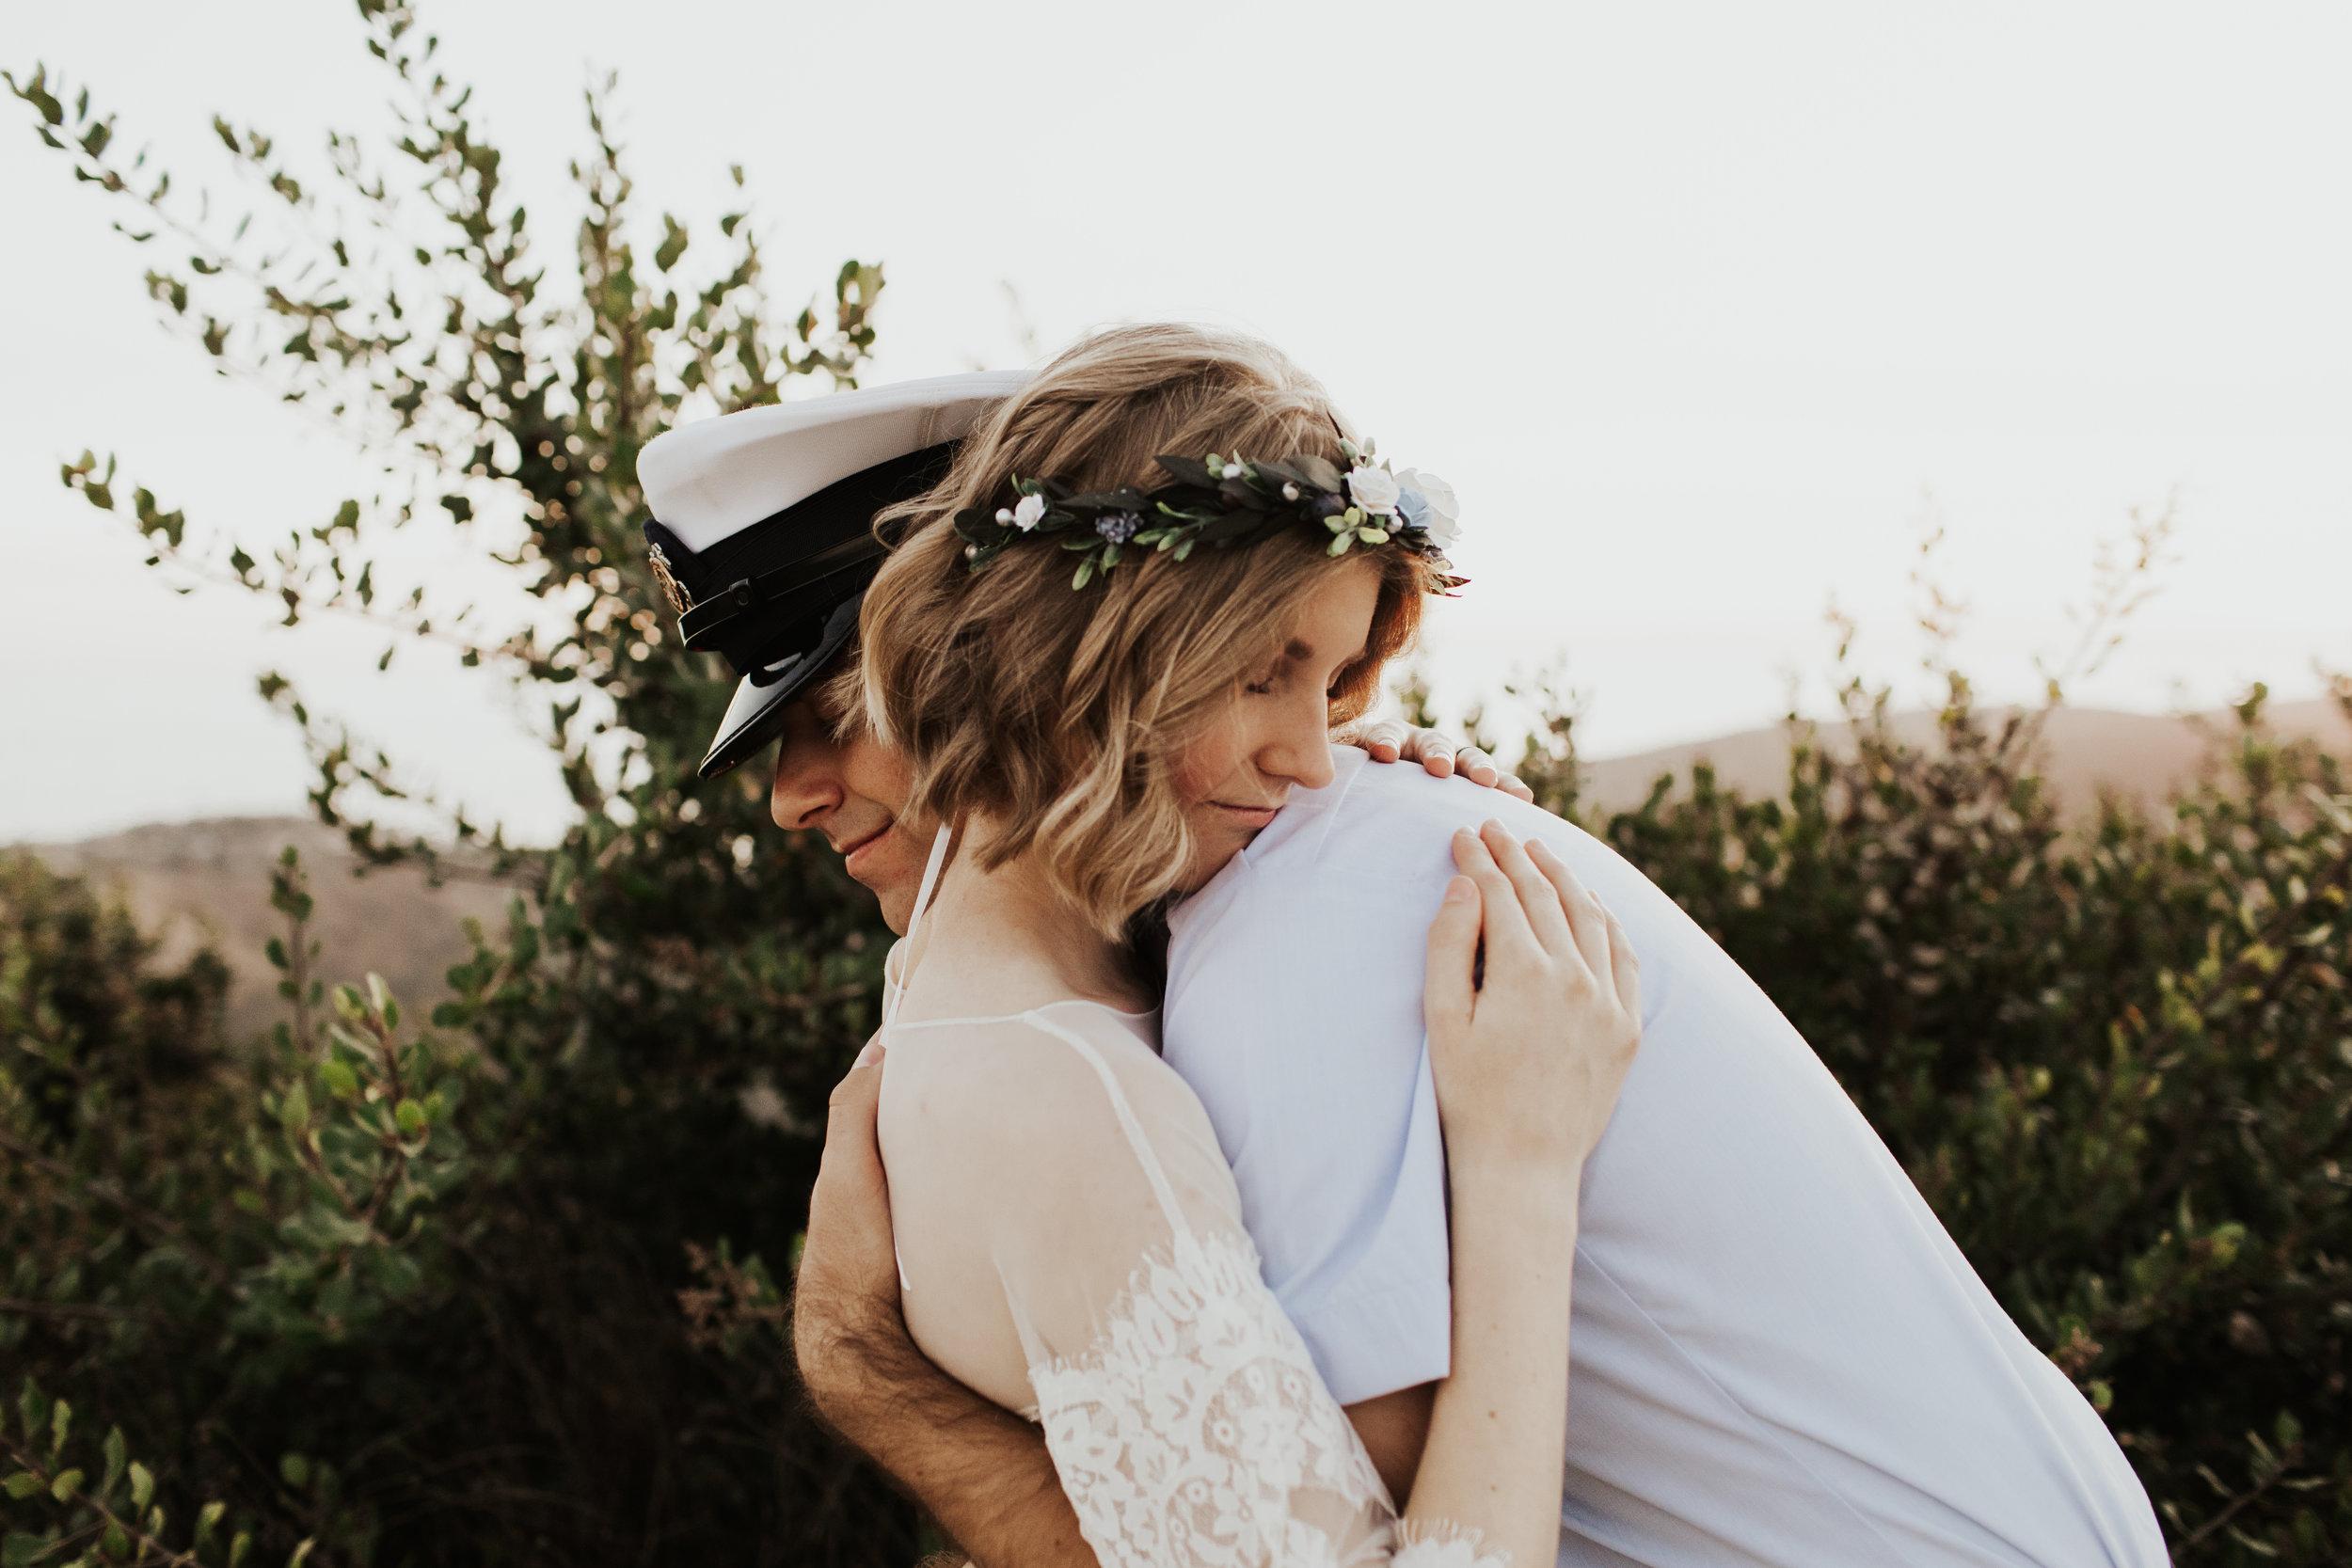 Jessie-Noah-Top-of-the-World-Laguna-Beach-Elopement-Bridal-Wedding-Session-FINISHED-65.jpg